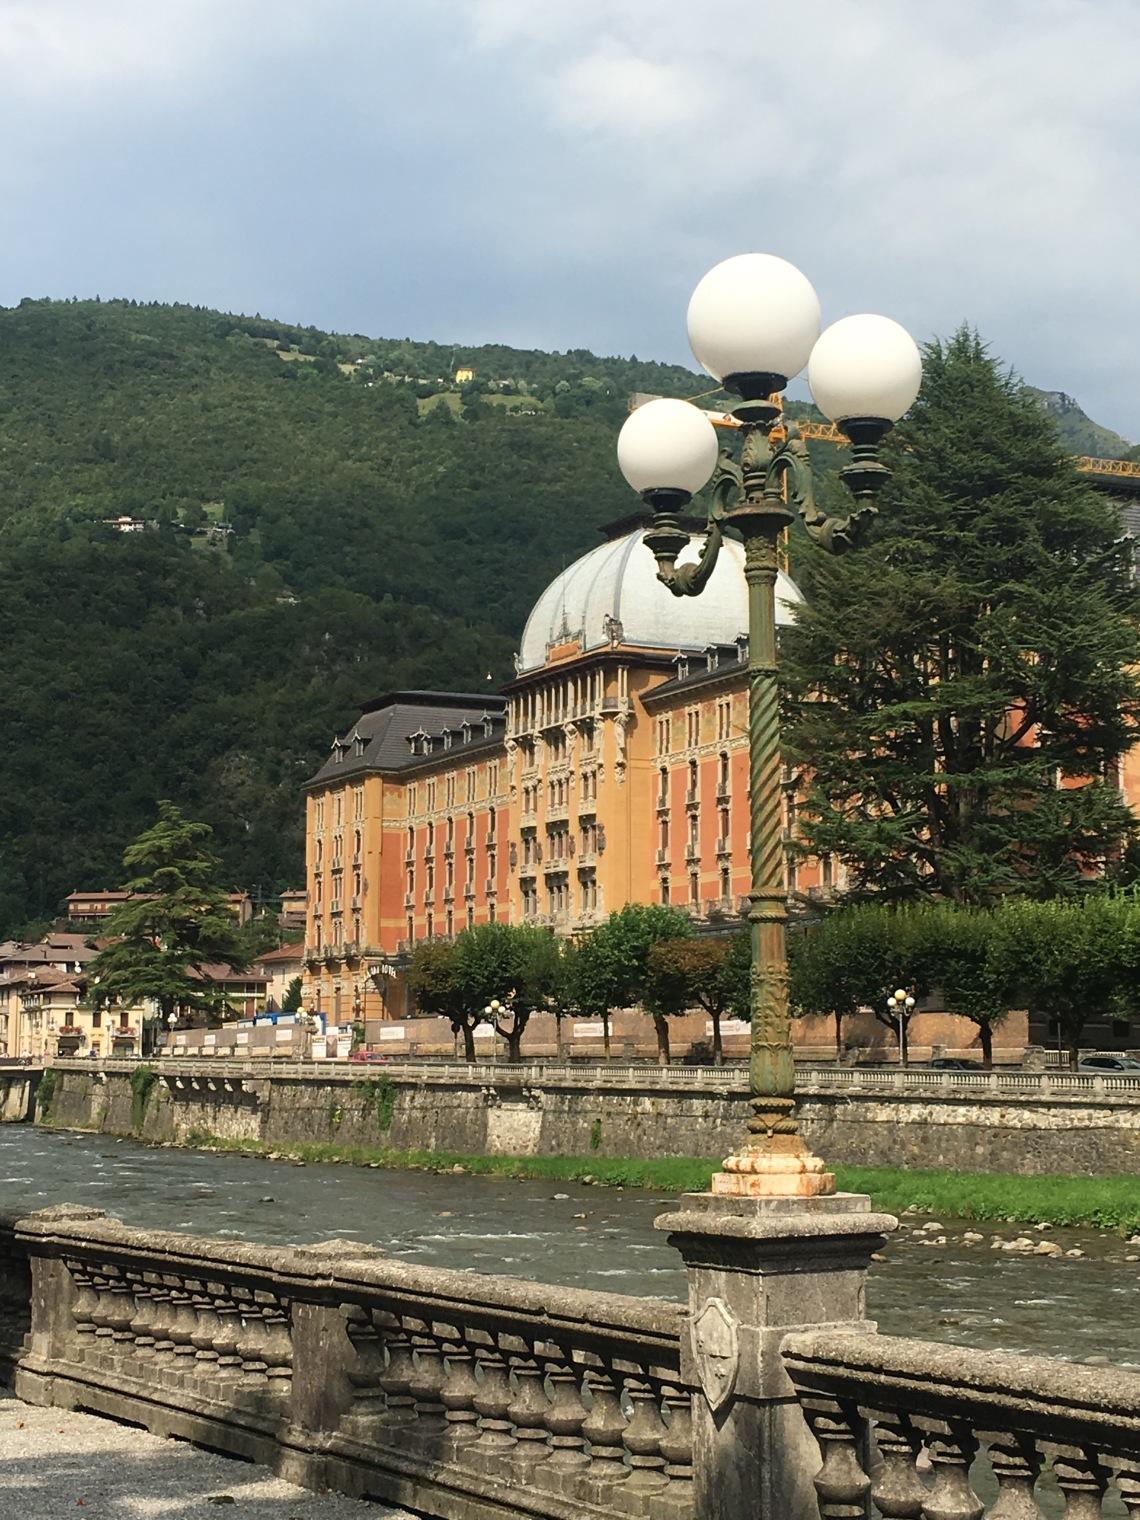 Grand Hotel di San Pellegrino Terme